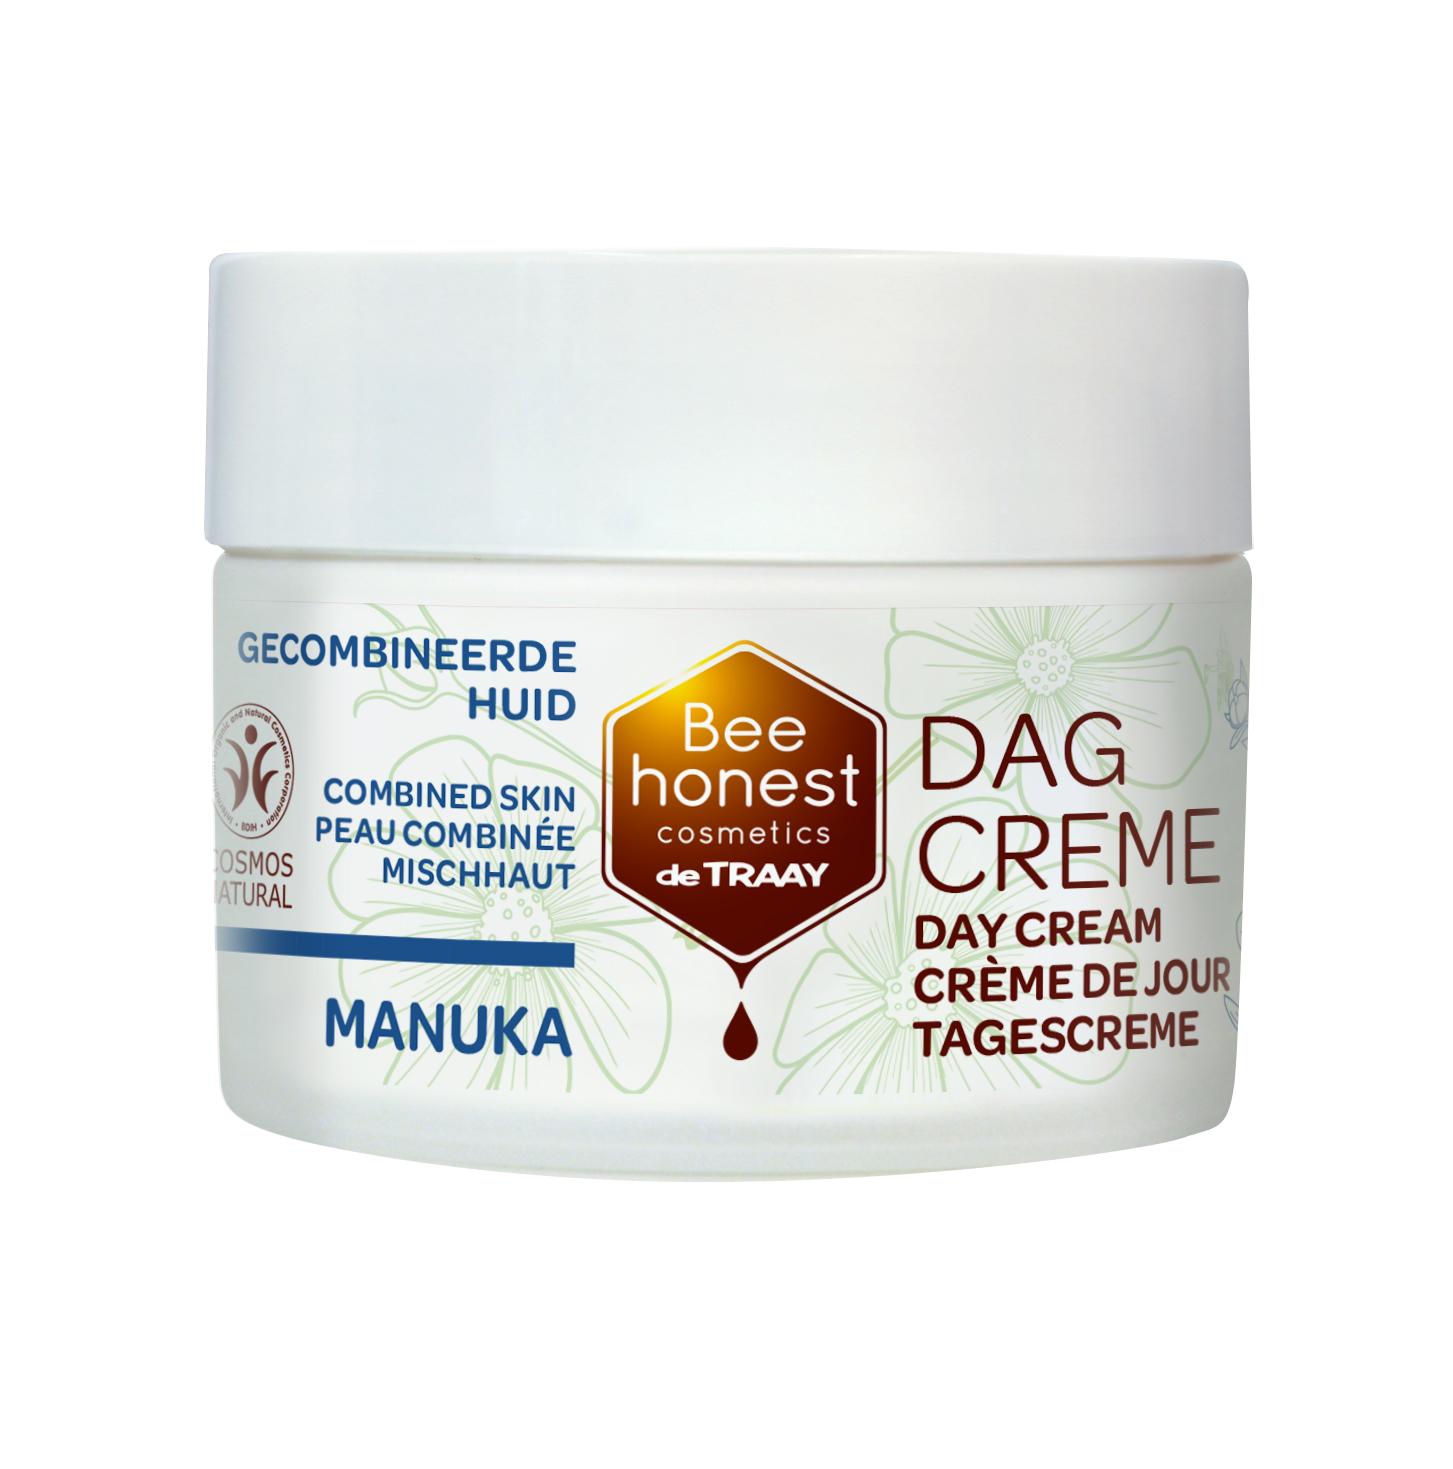 Day cream Manuka